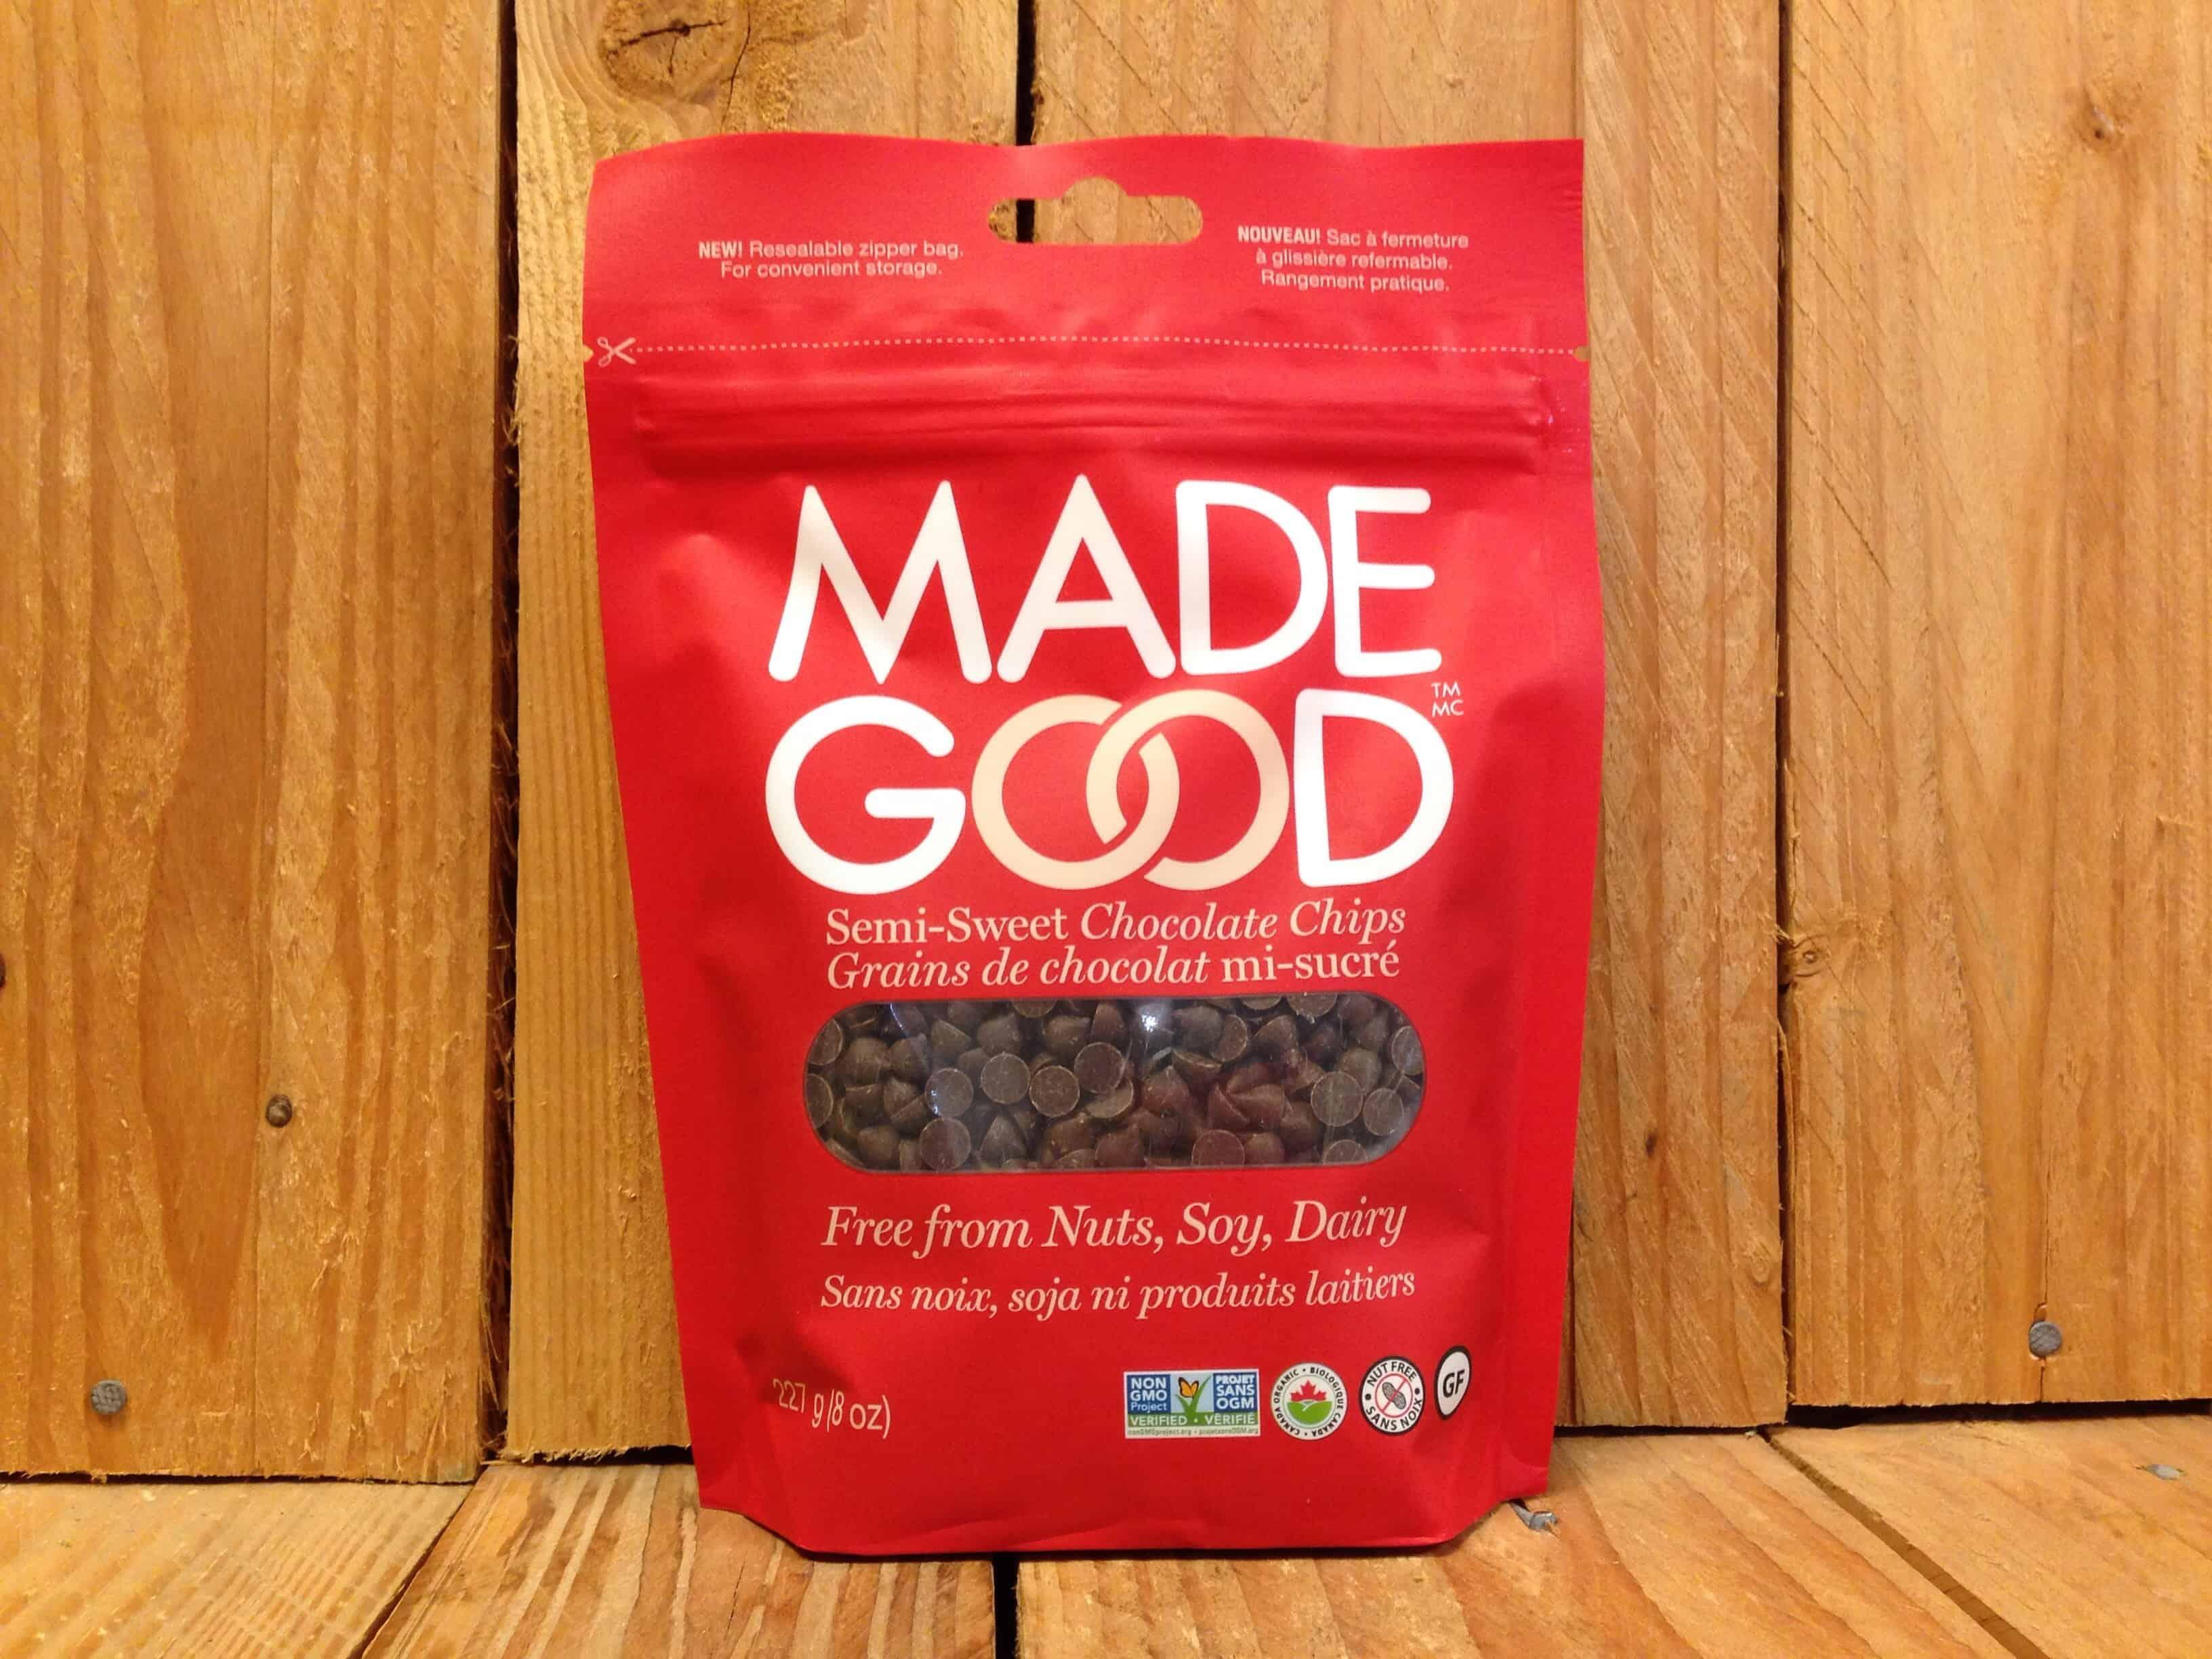 Made Good – Organic Semi-Sweet Chocolate Chips (227g)